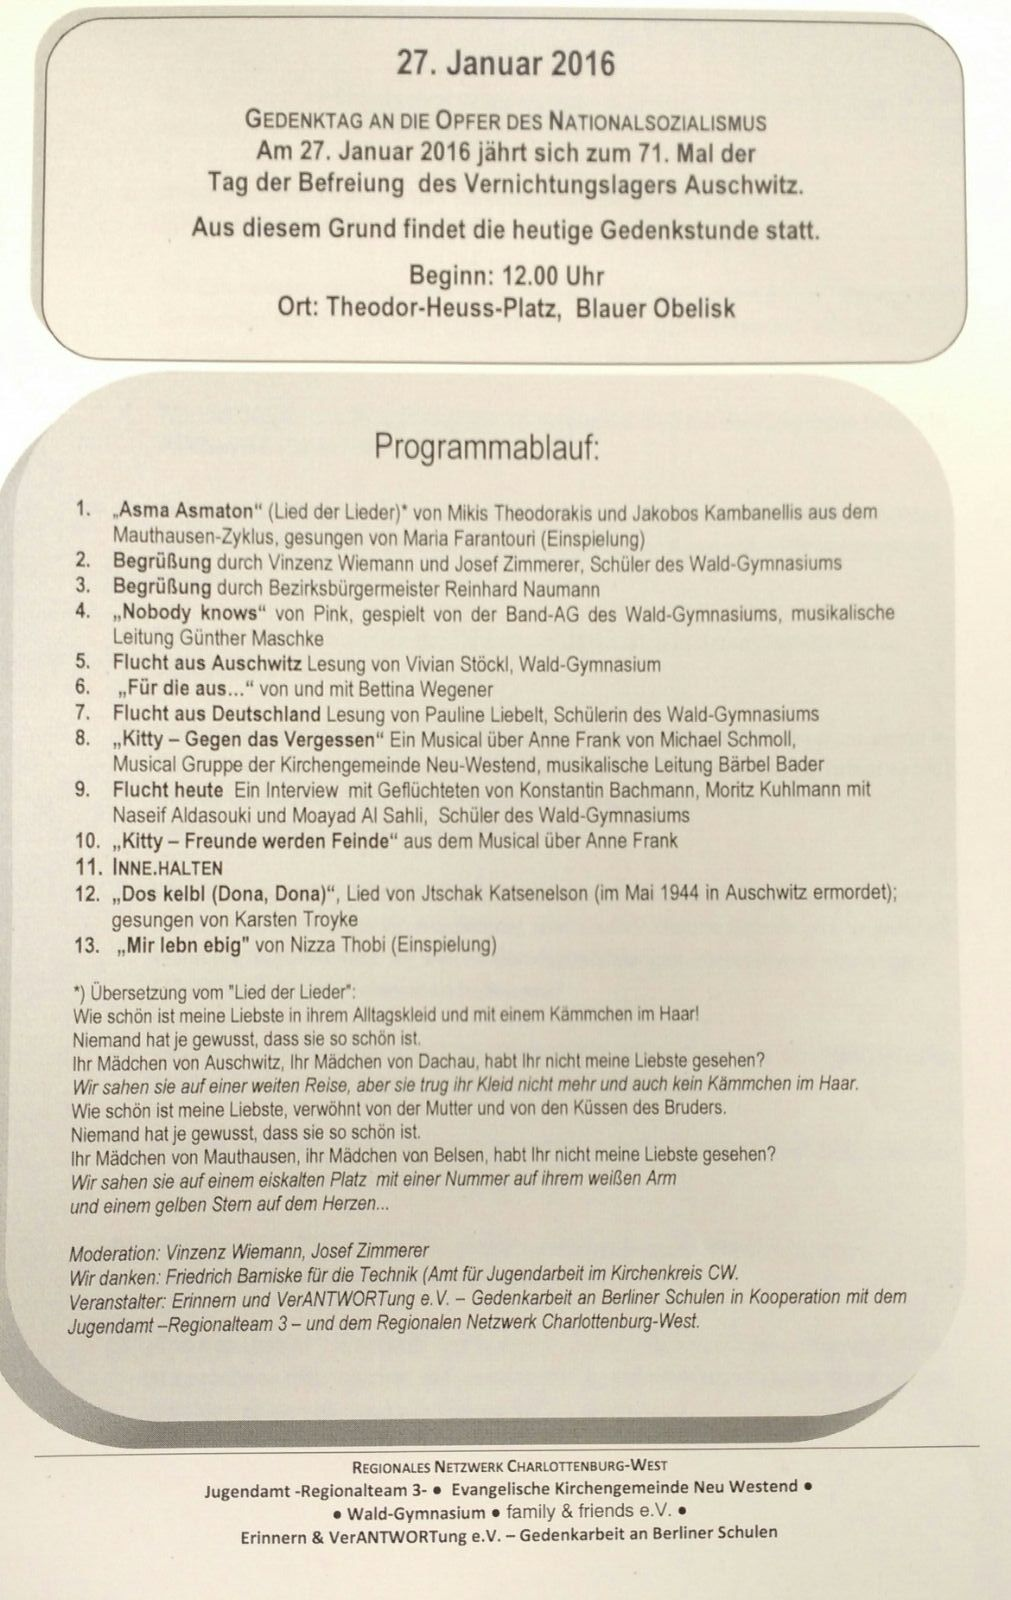 Programm_27Januar